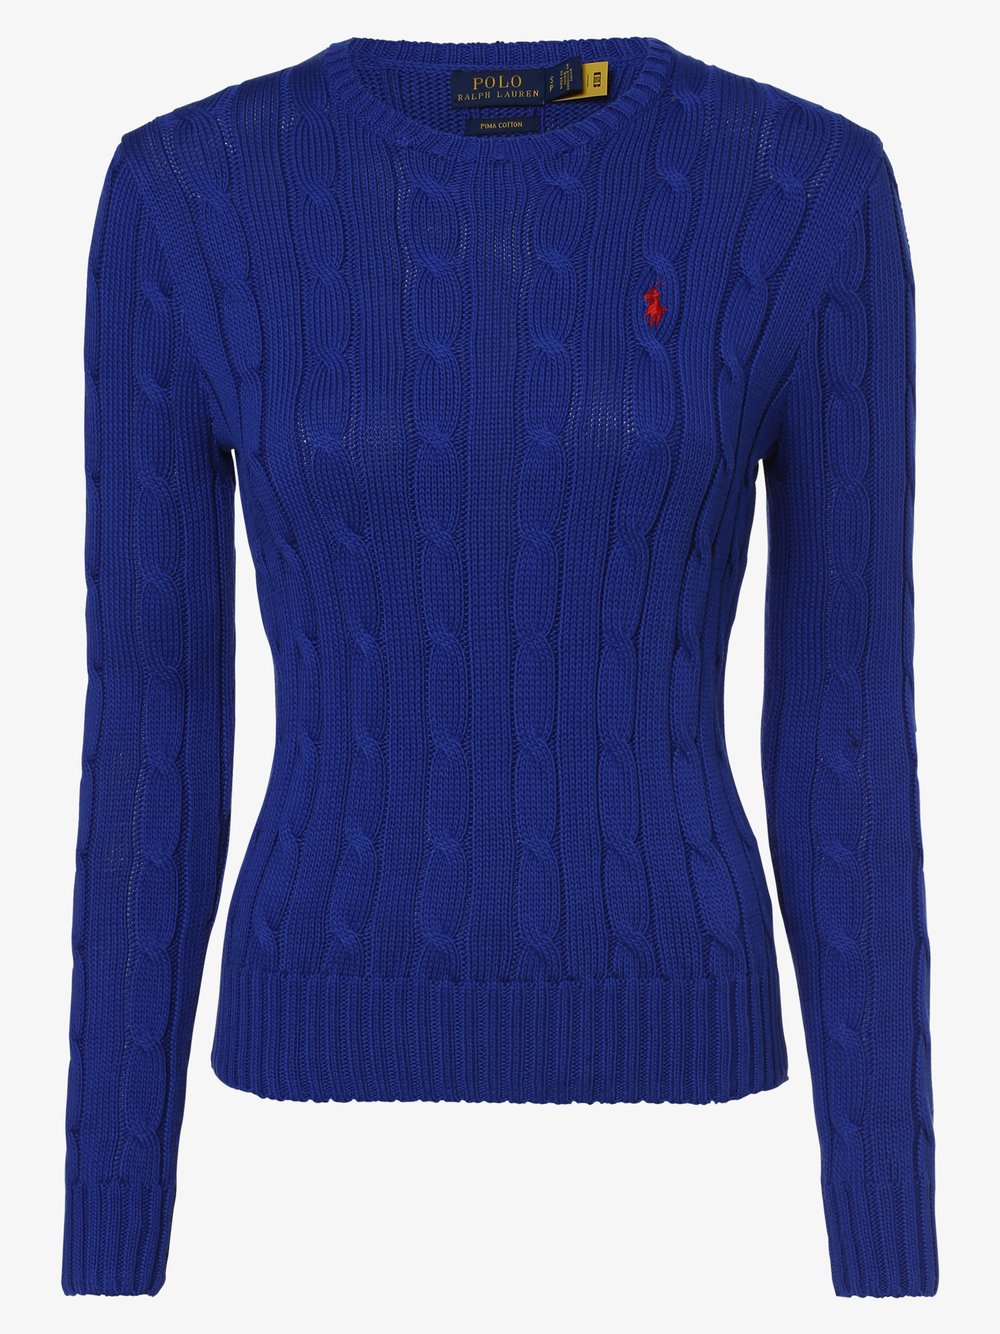 Polo Ralph Lauren - Sweter damski, niebieski